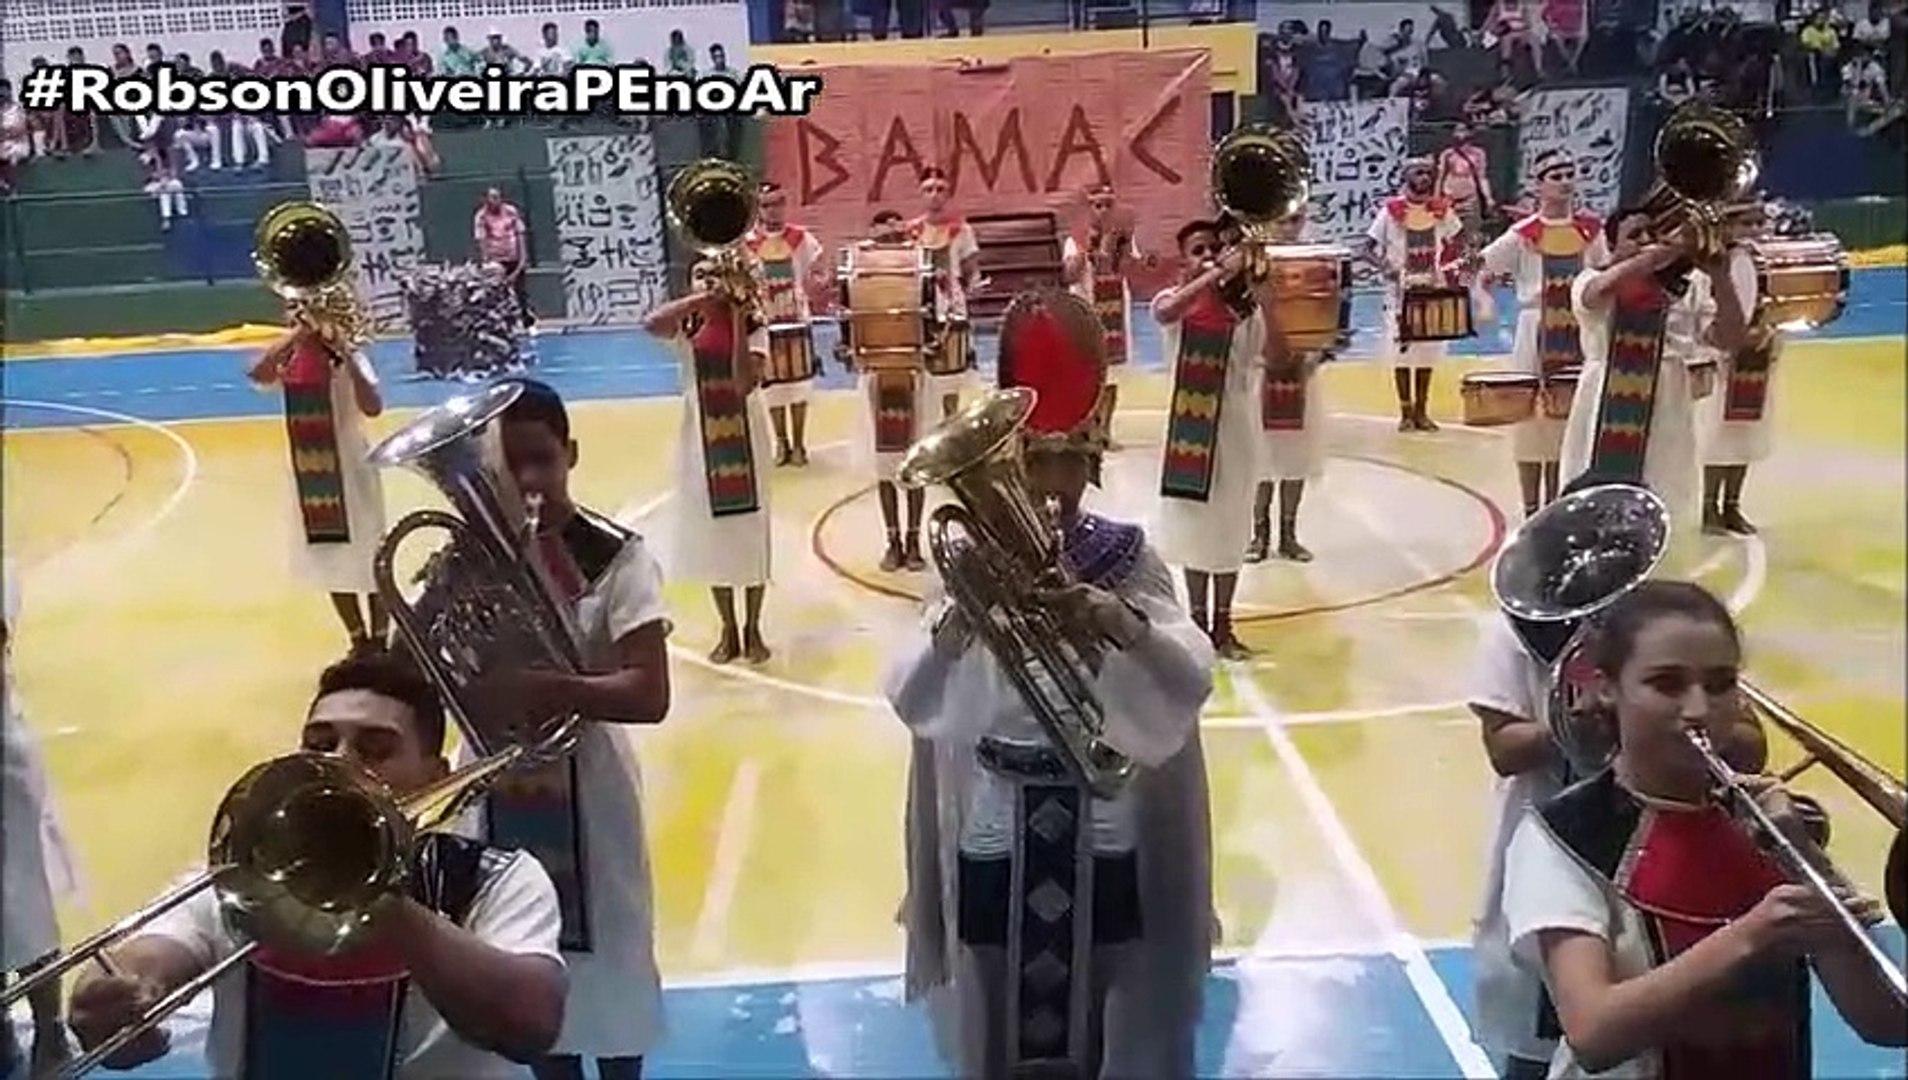 VI COPA NACIONAL DE CAMPEÃS BANDA SHOW BAMAC-CE